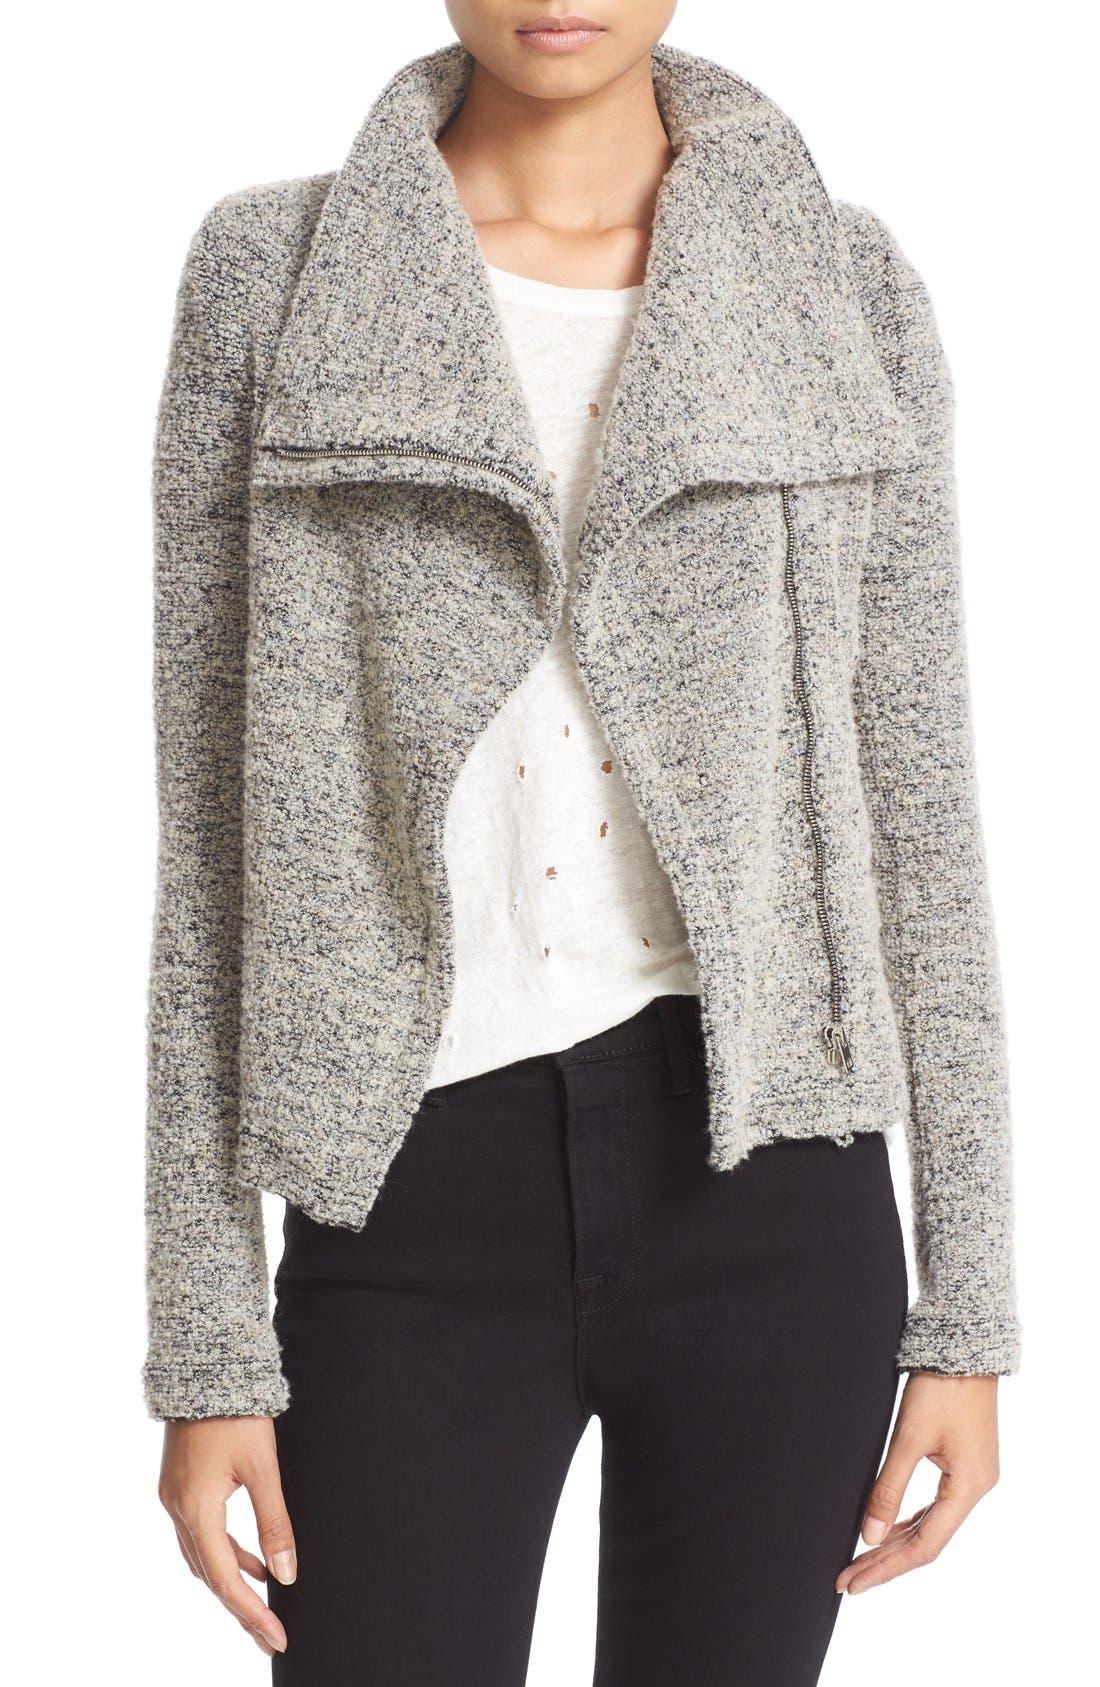 Alternate Image 1 Selected - IRO Drape Front Bouclé Knit Jacket